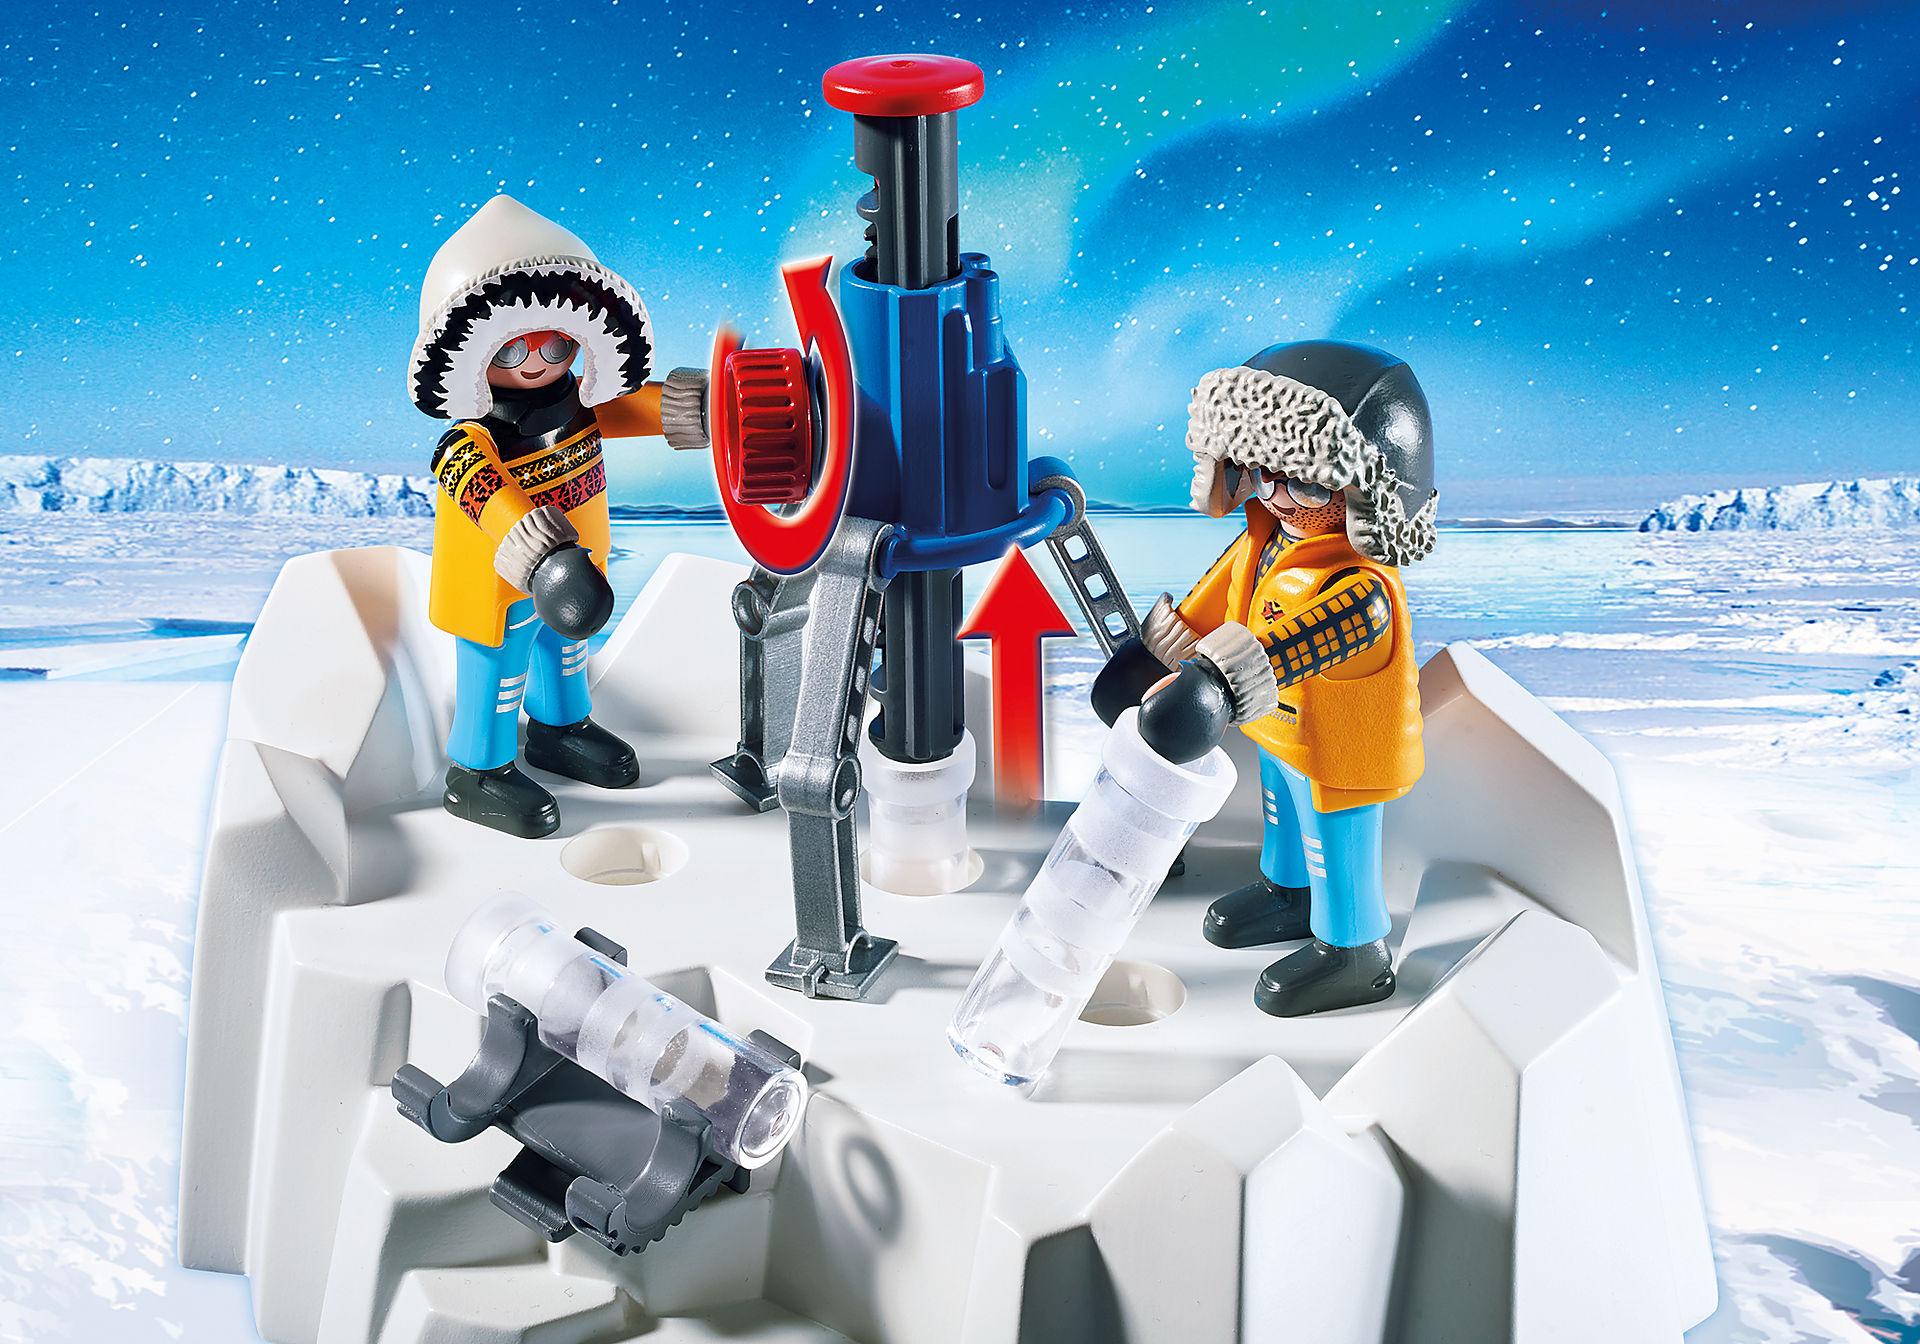 http://media.playmobil.com/i/playmobil/9056_product_extra1/Polar Ranger mit Eisbären